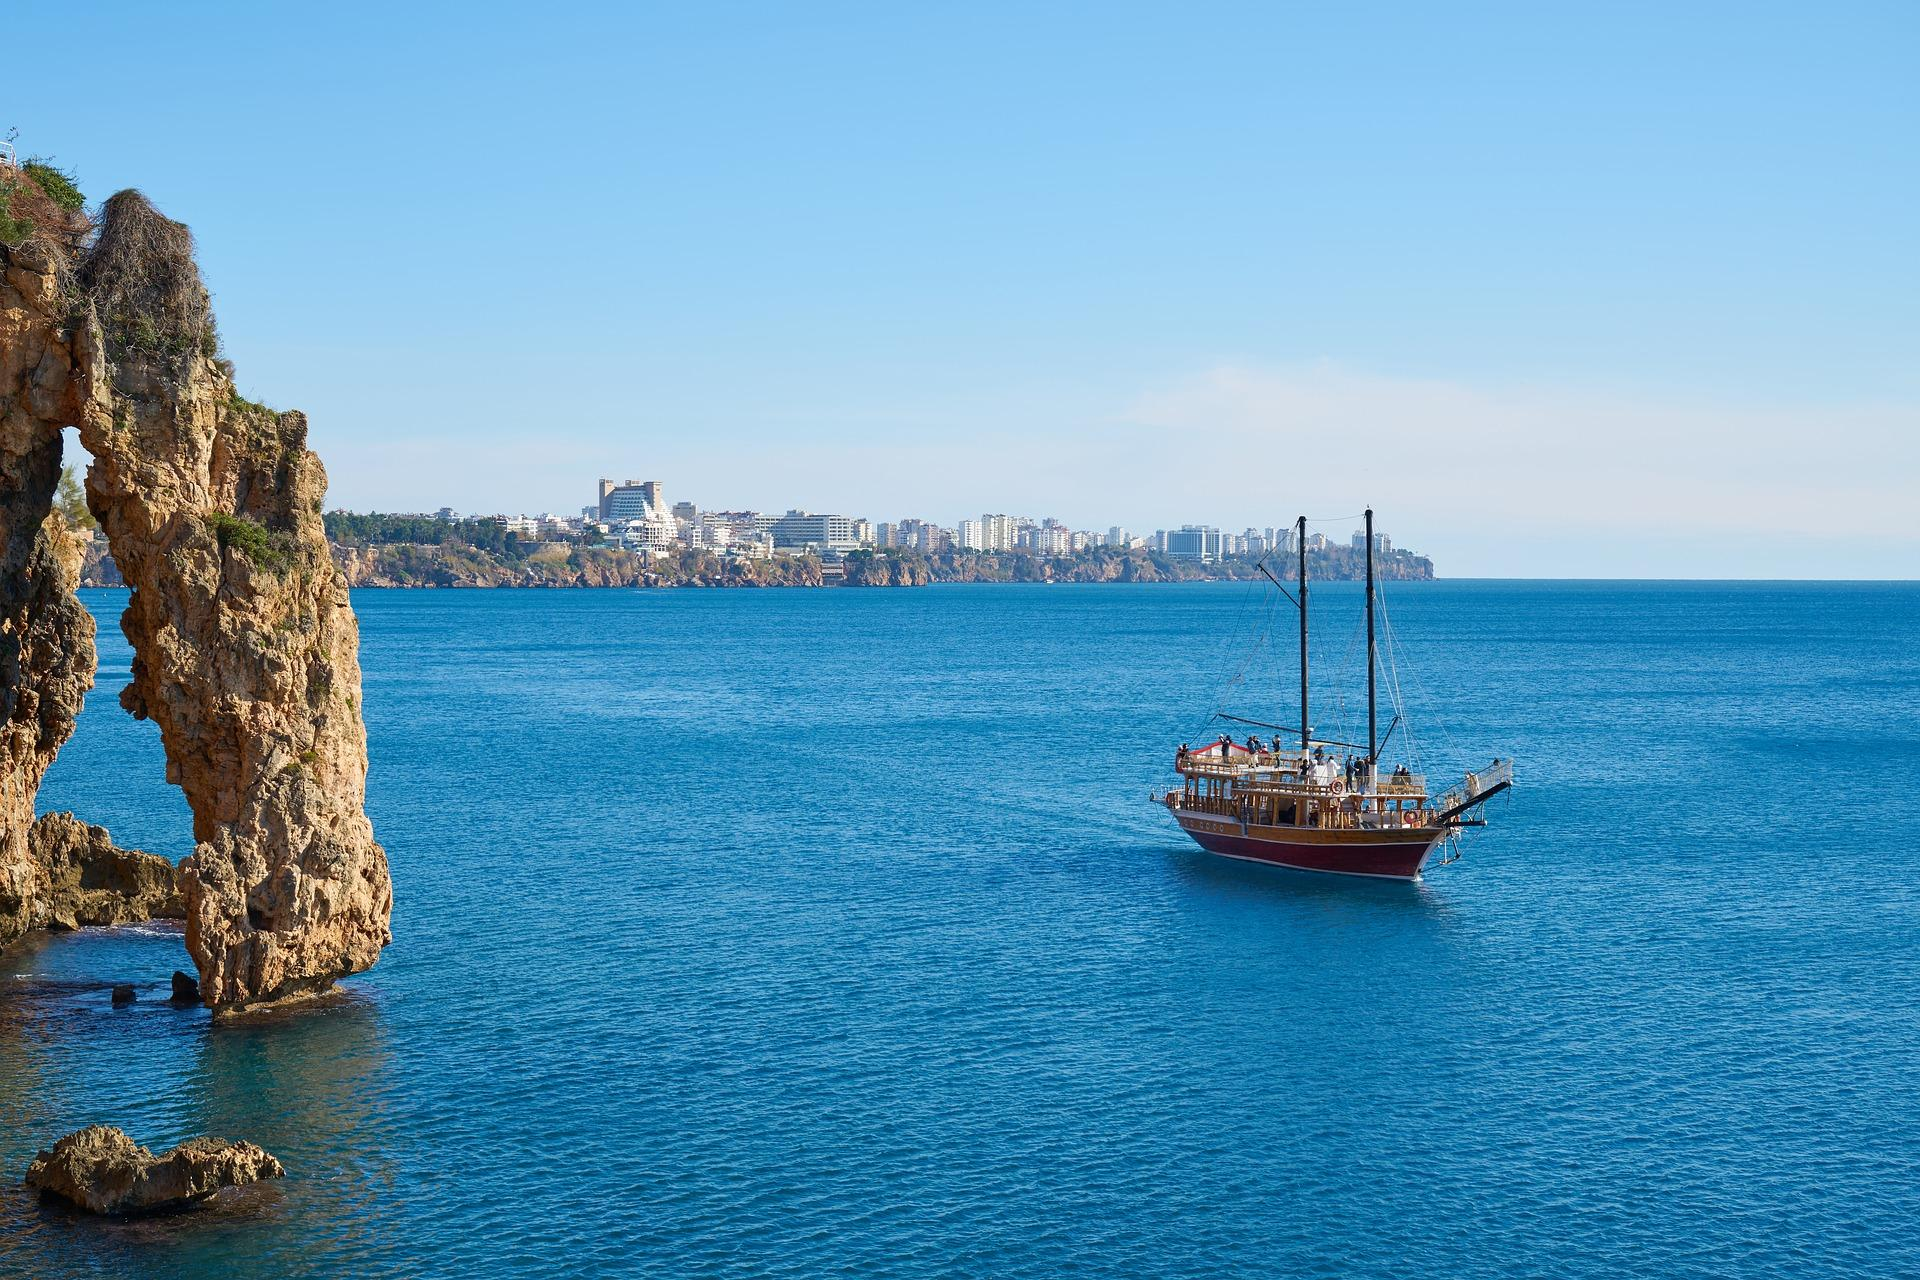 Küste bei Antalya, Türkei